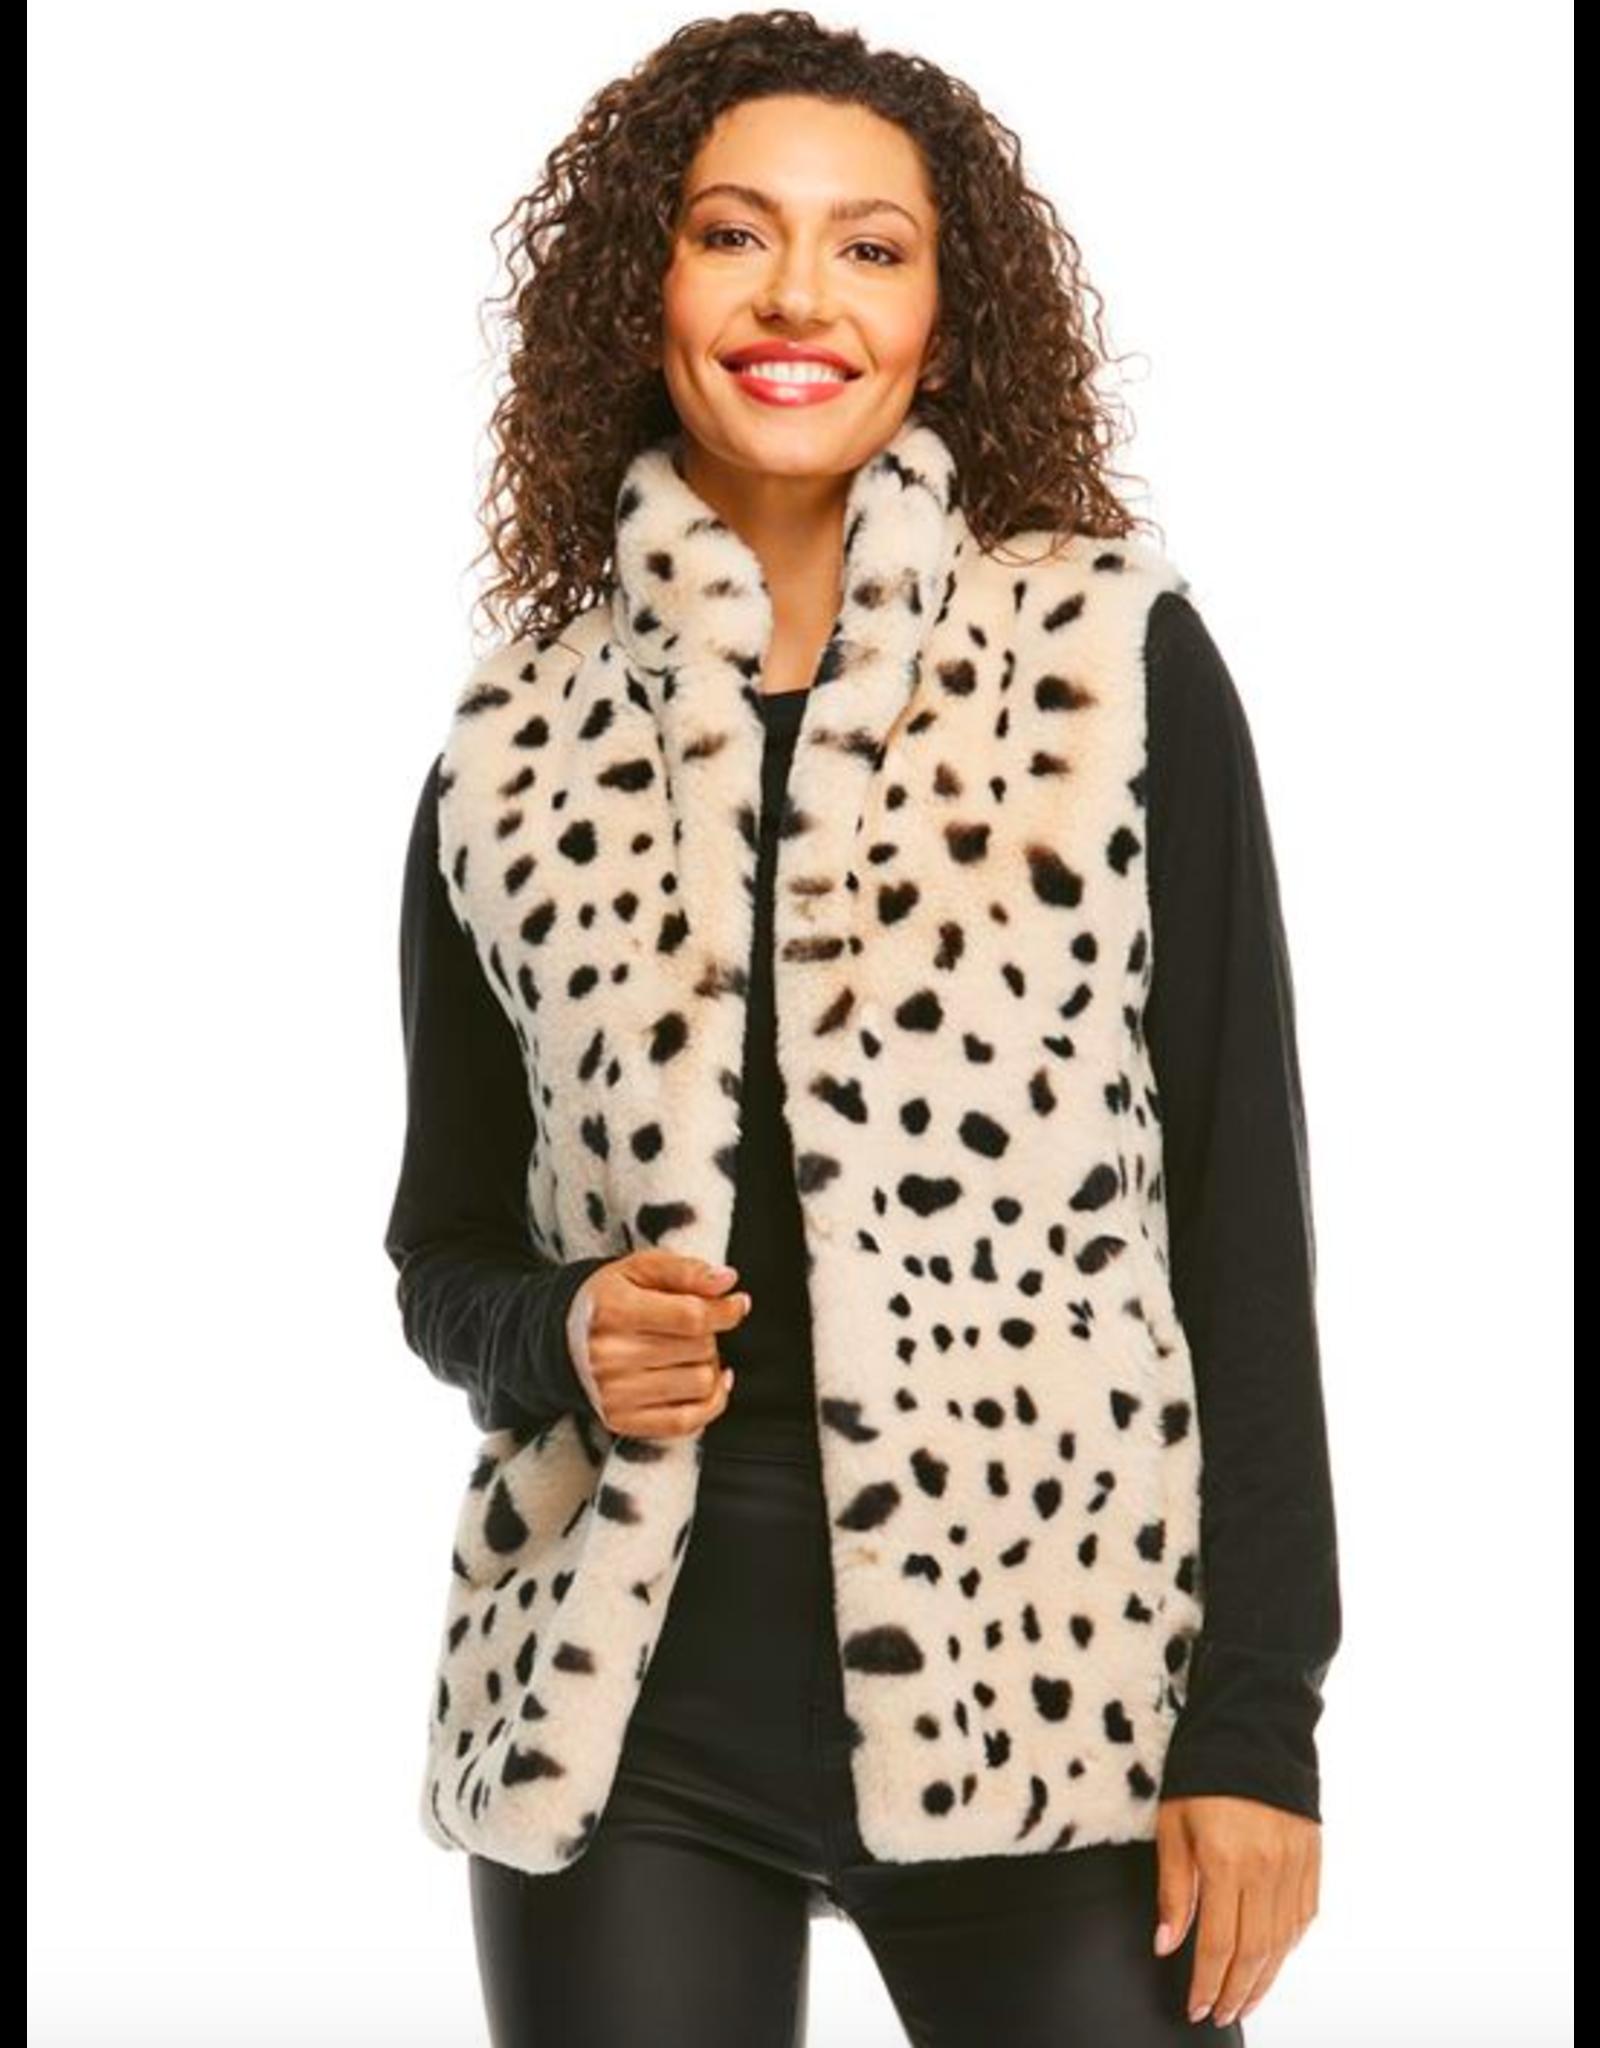 Donna Salyers Fabulous Furs Wild Cheetah Faux Fur BFF Vest Size Small